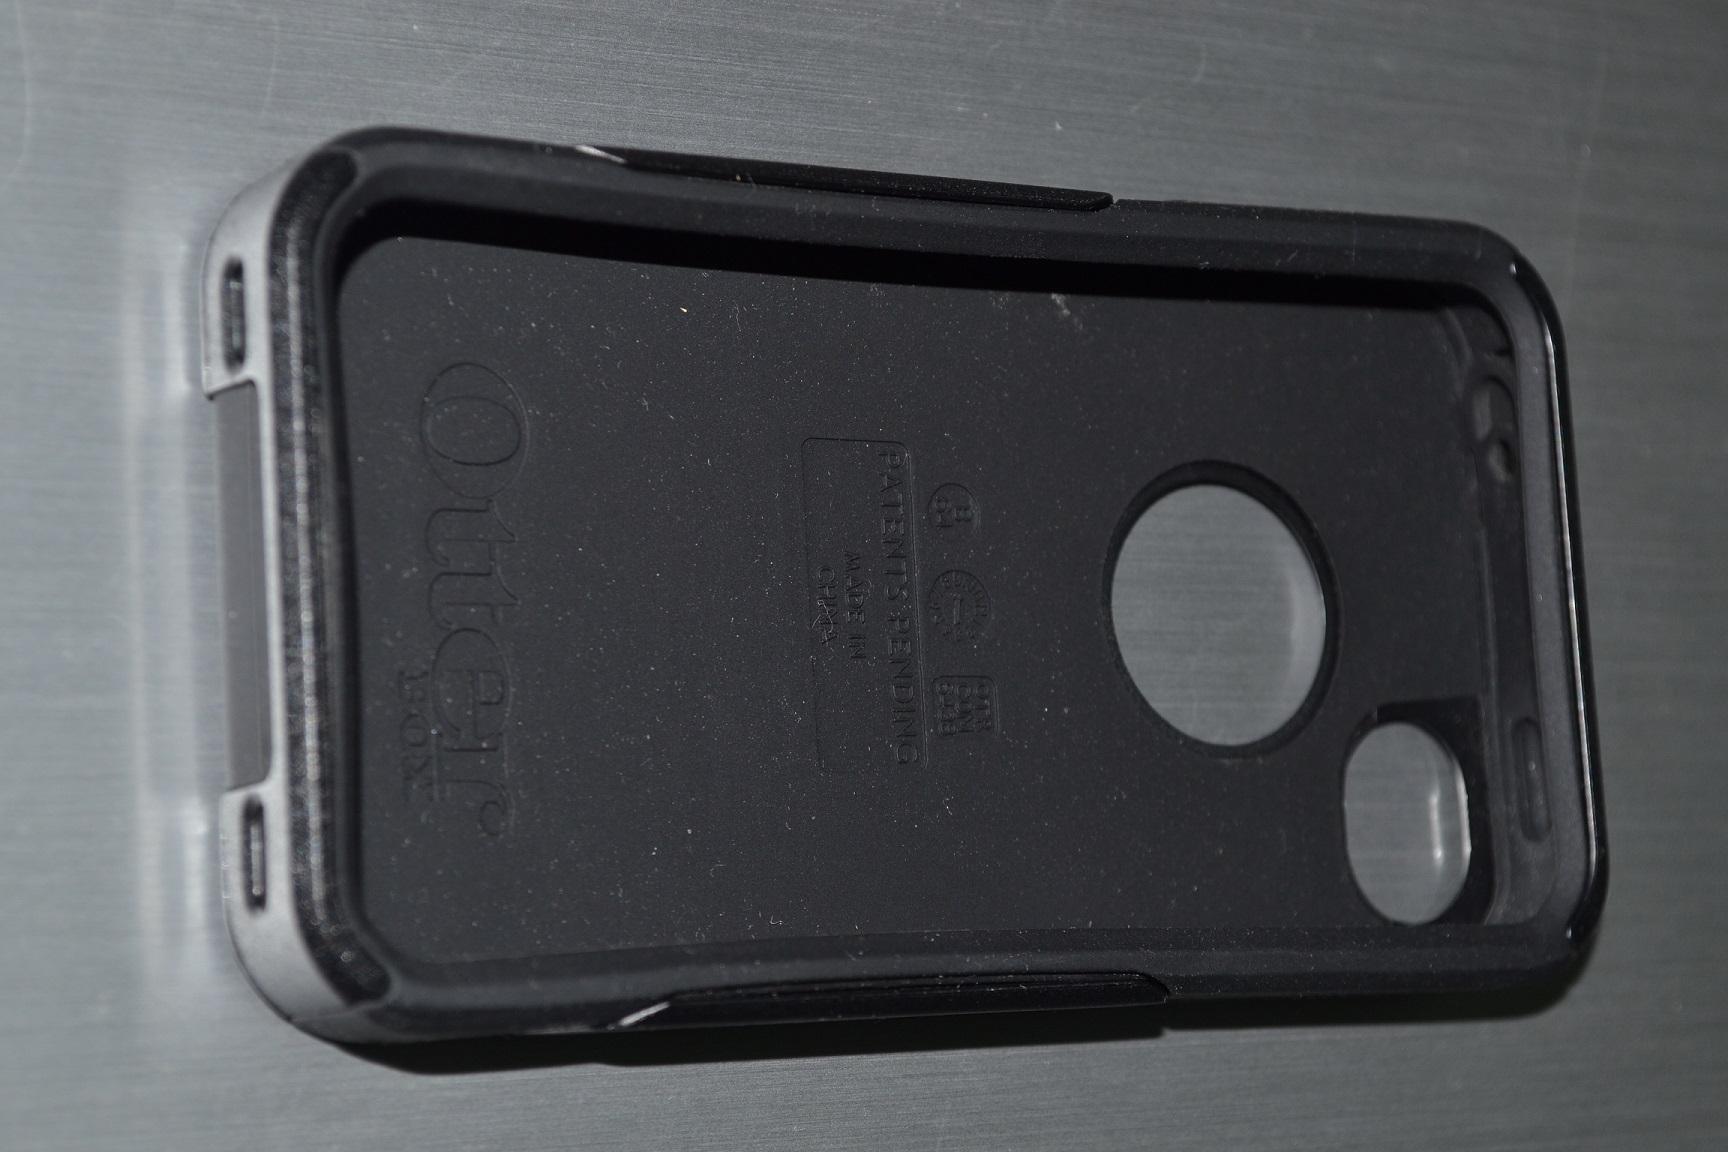 iPhone 4S (4).JPG